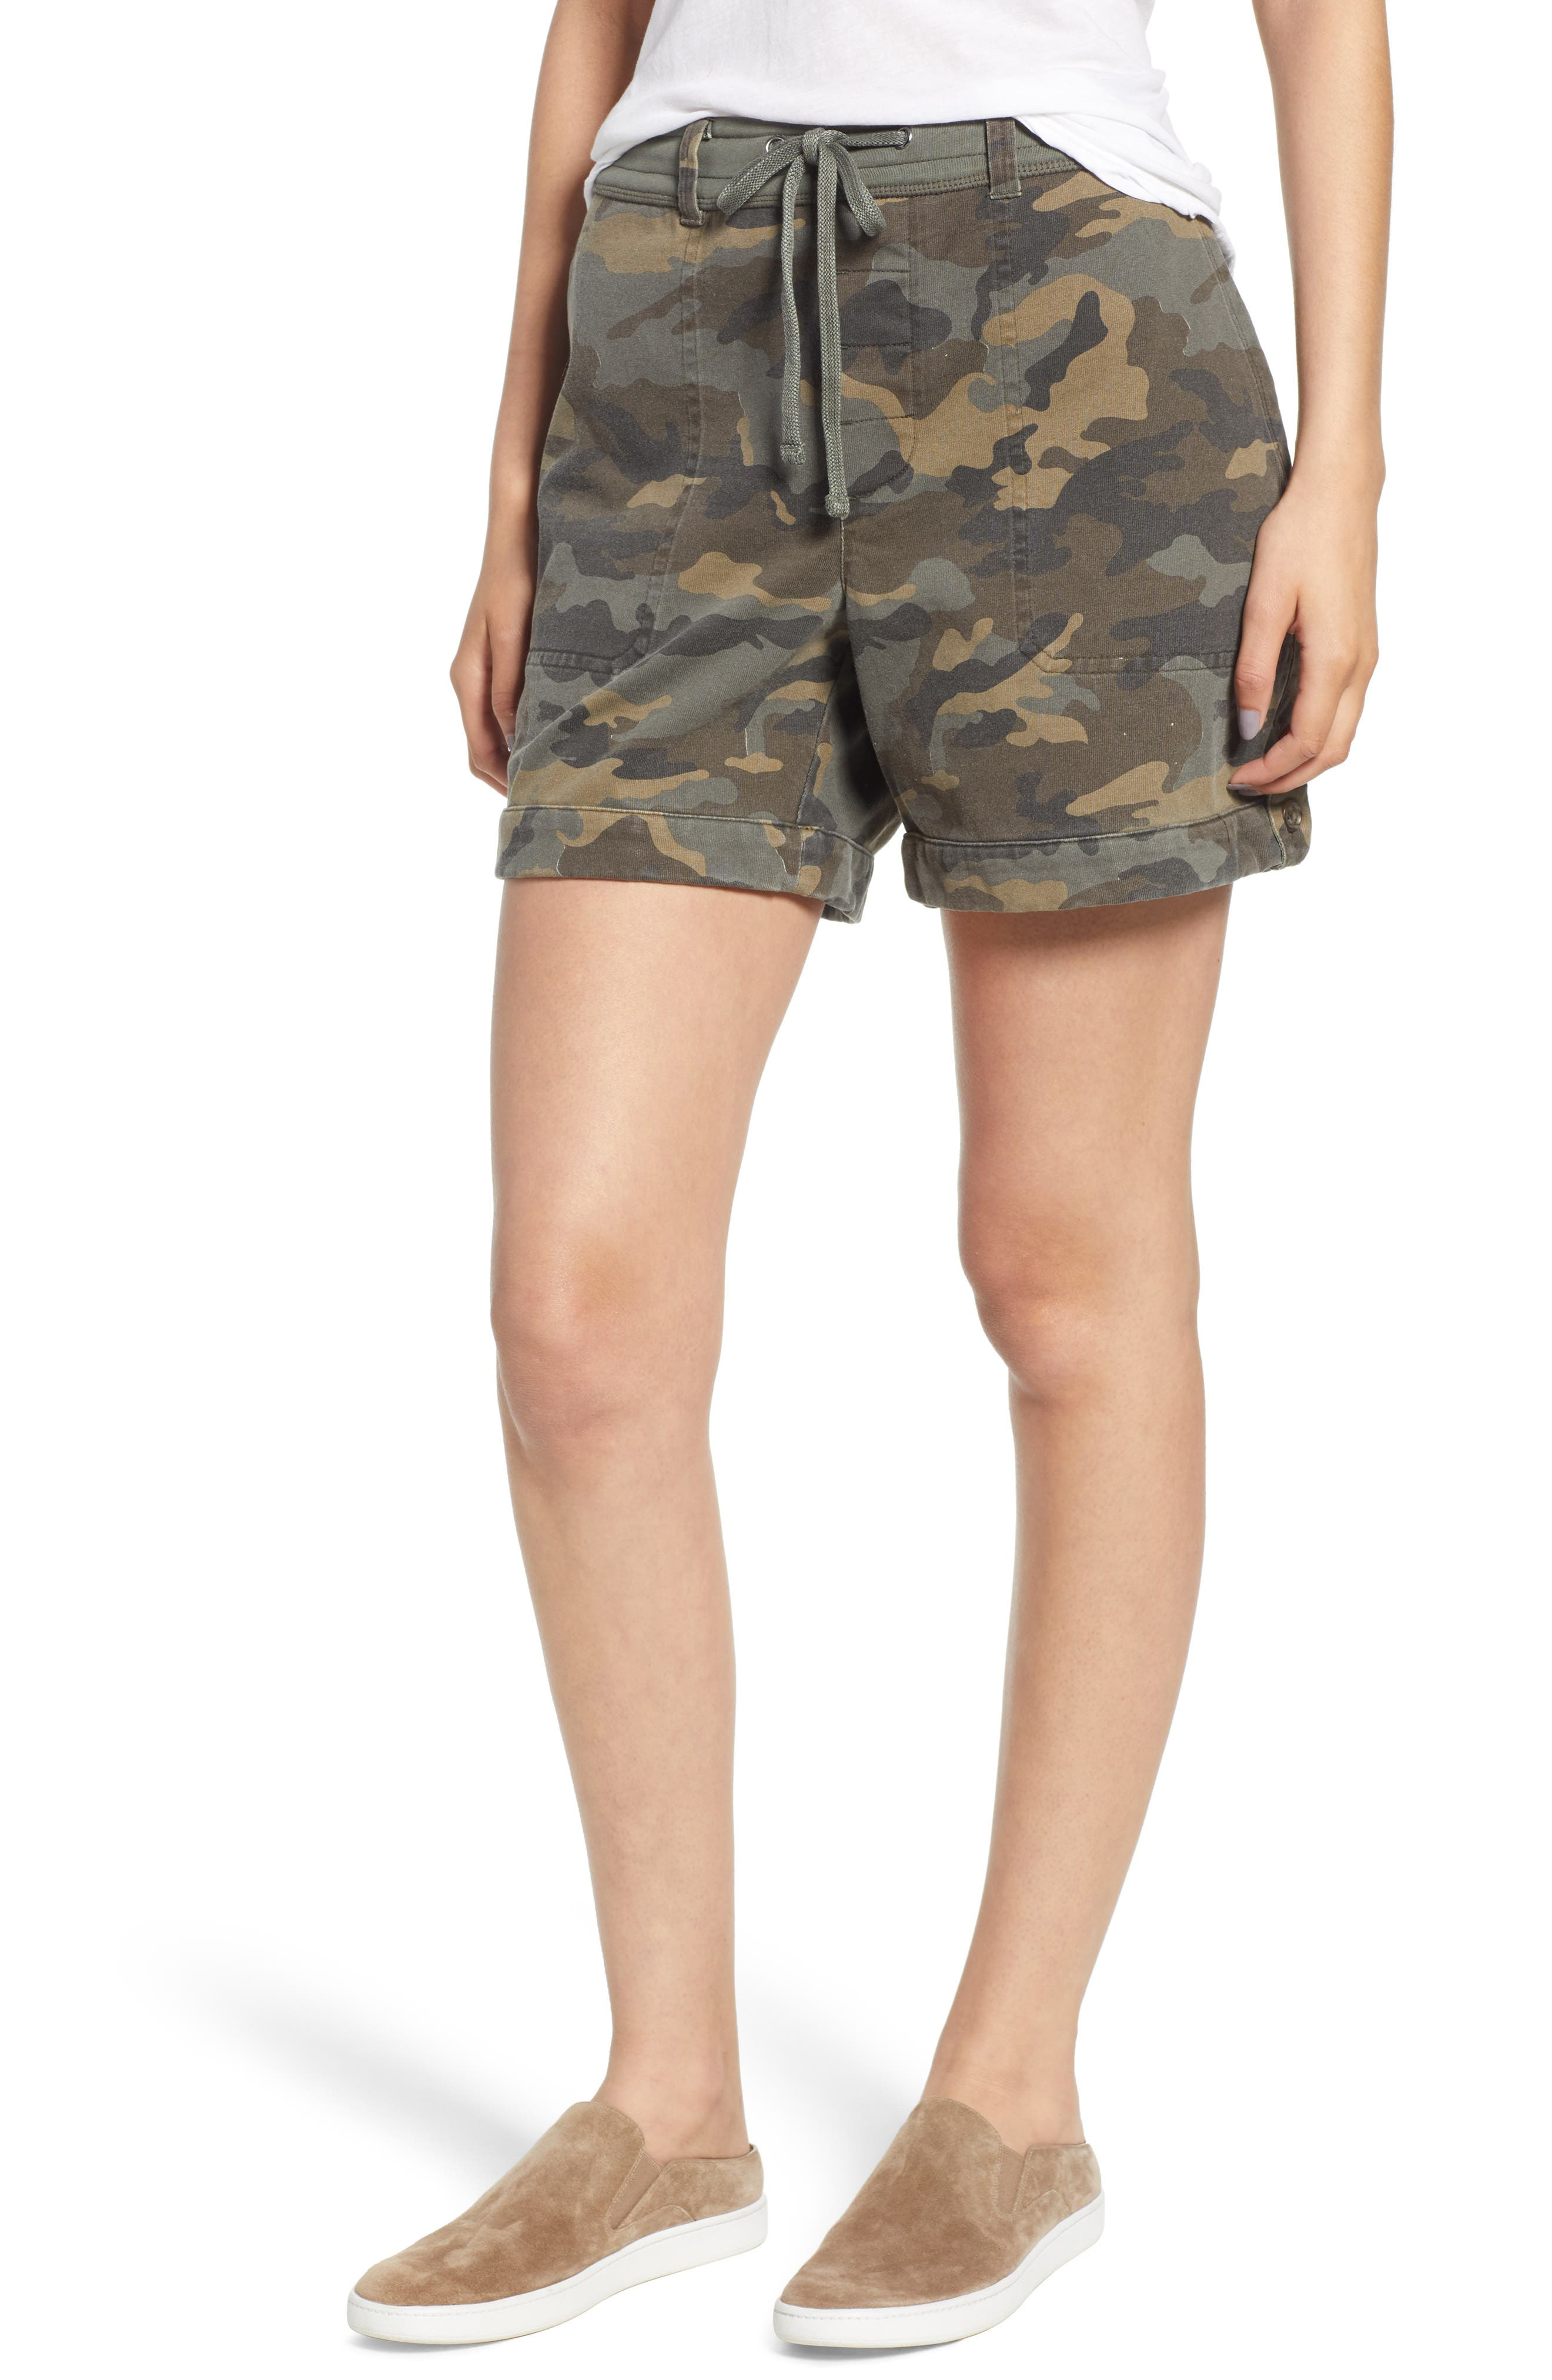 JAMES PERSE Camo Shorts, Main, color, 005